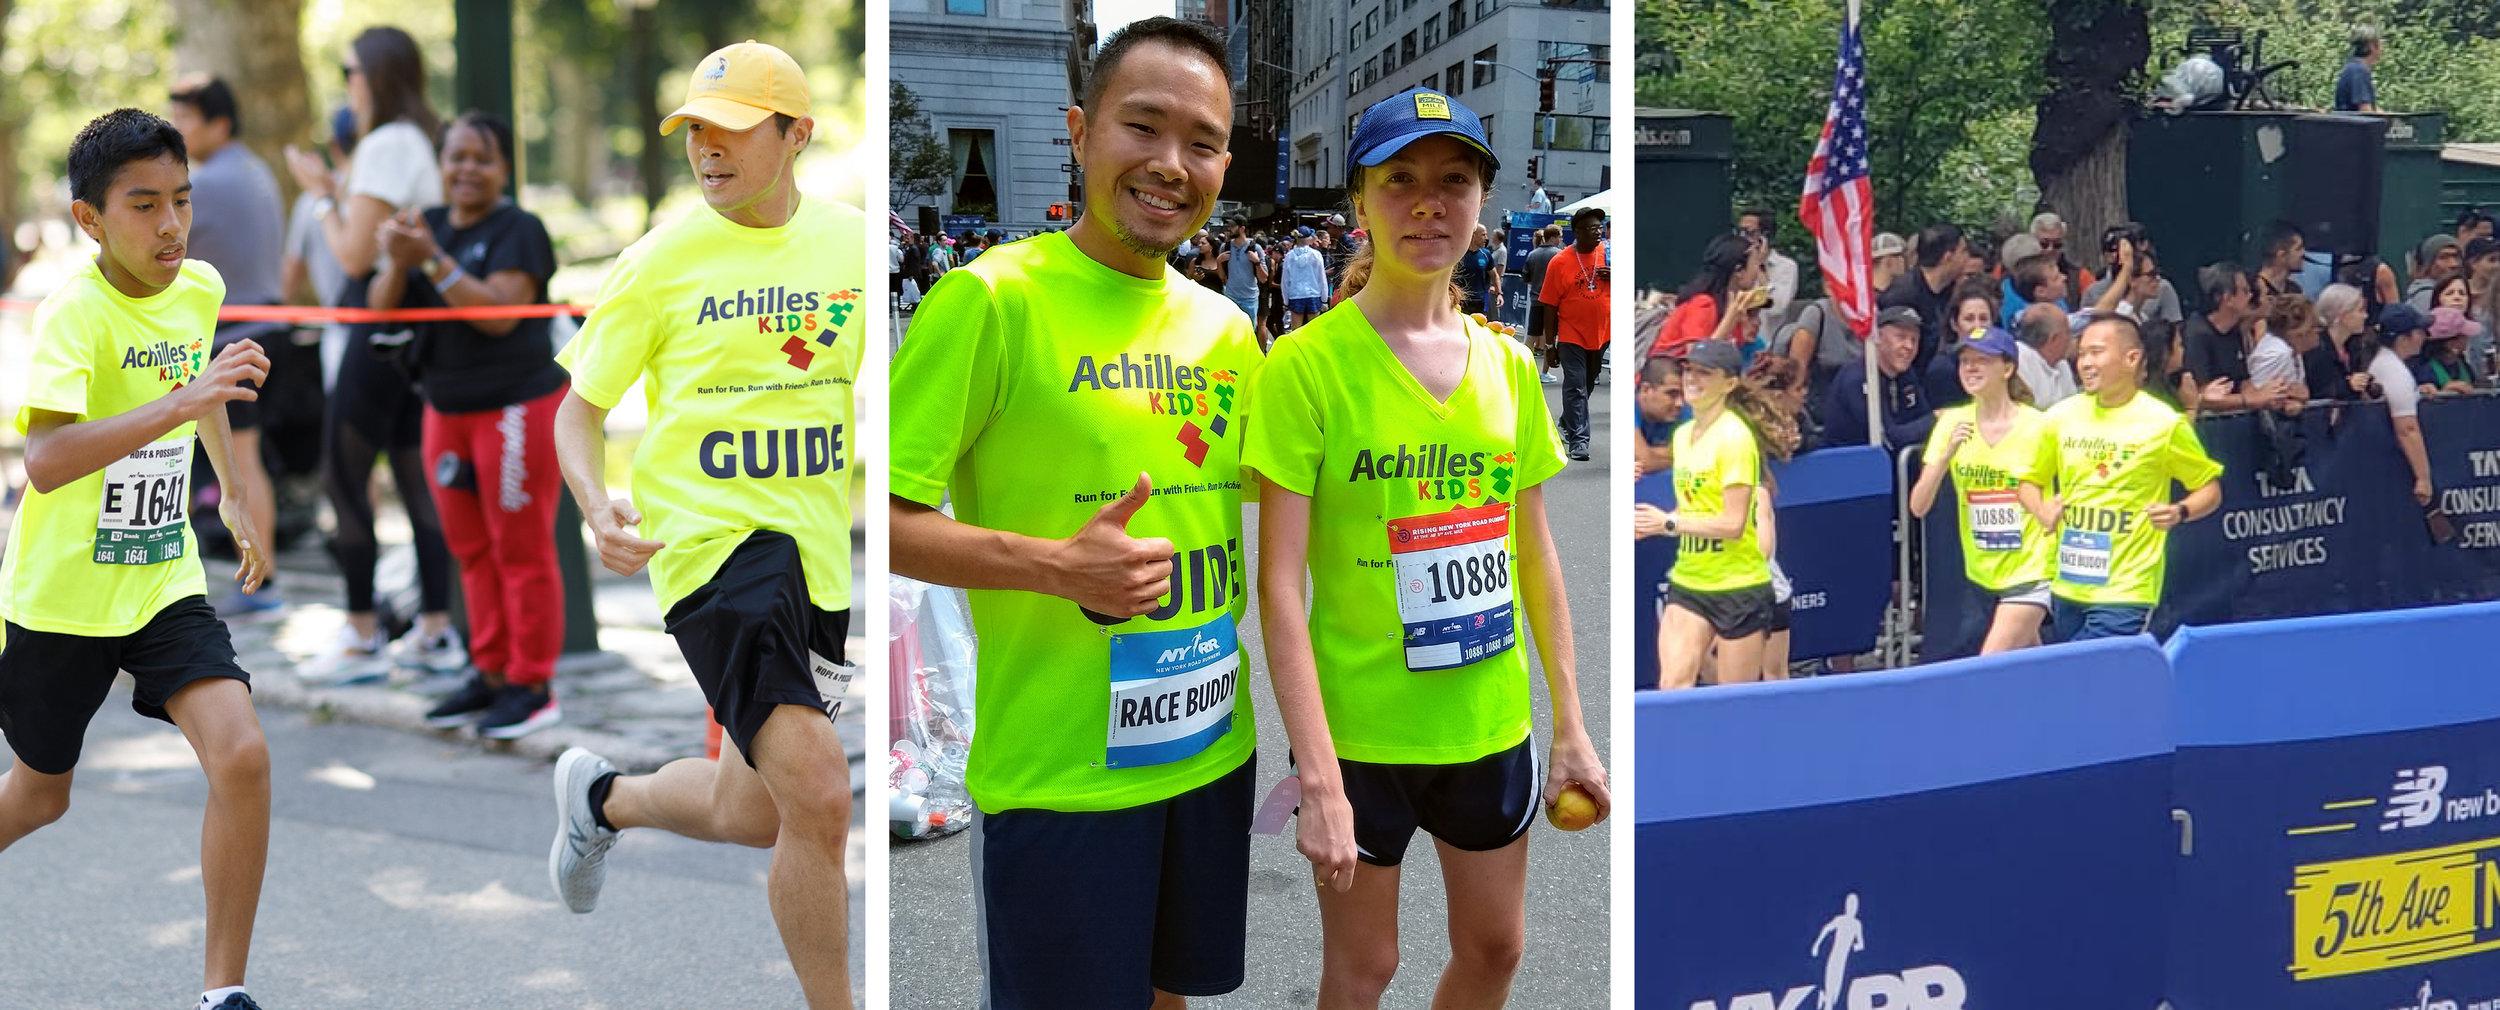 Achilles Kids Volunteer of the Month: David Law